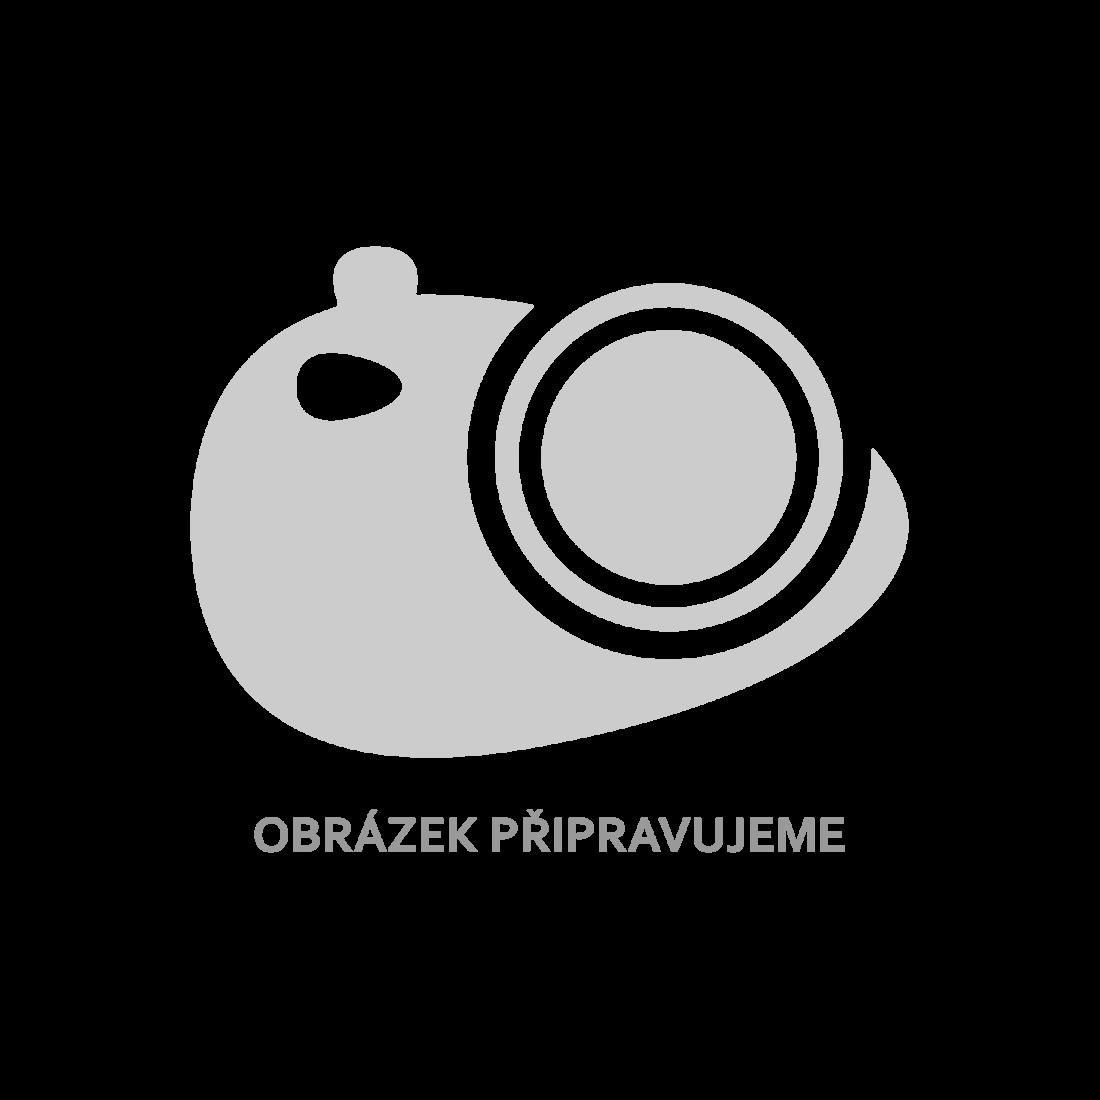 vidaXL Knihovna černá 60 x 35 x 180 cm dřevotříska [803408]